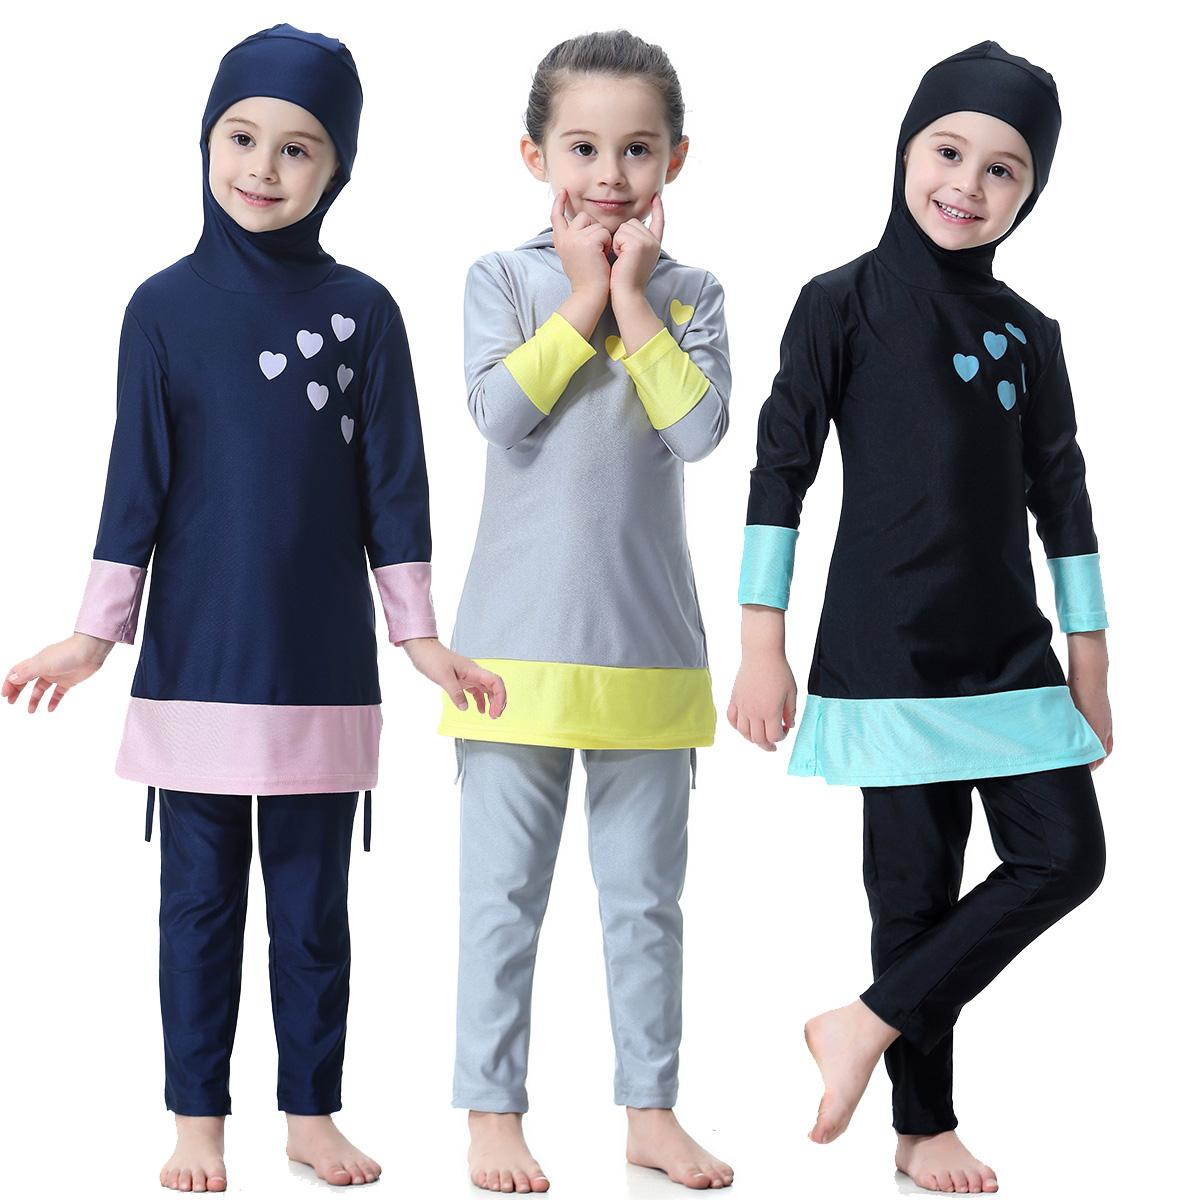 Cute Muslim Kids Girl Full Cover Swimwear Islamic Long Sleeve Arab Modest Swimsuits Swim Clothes Beachwear Children Suit Set New